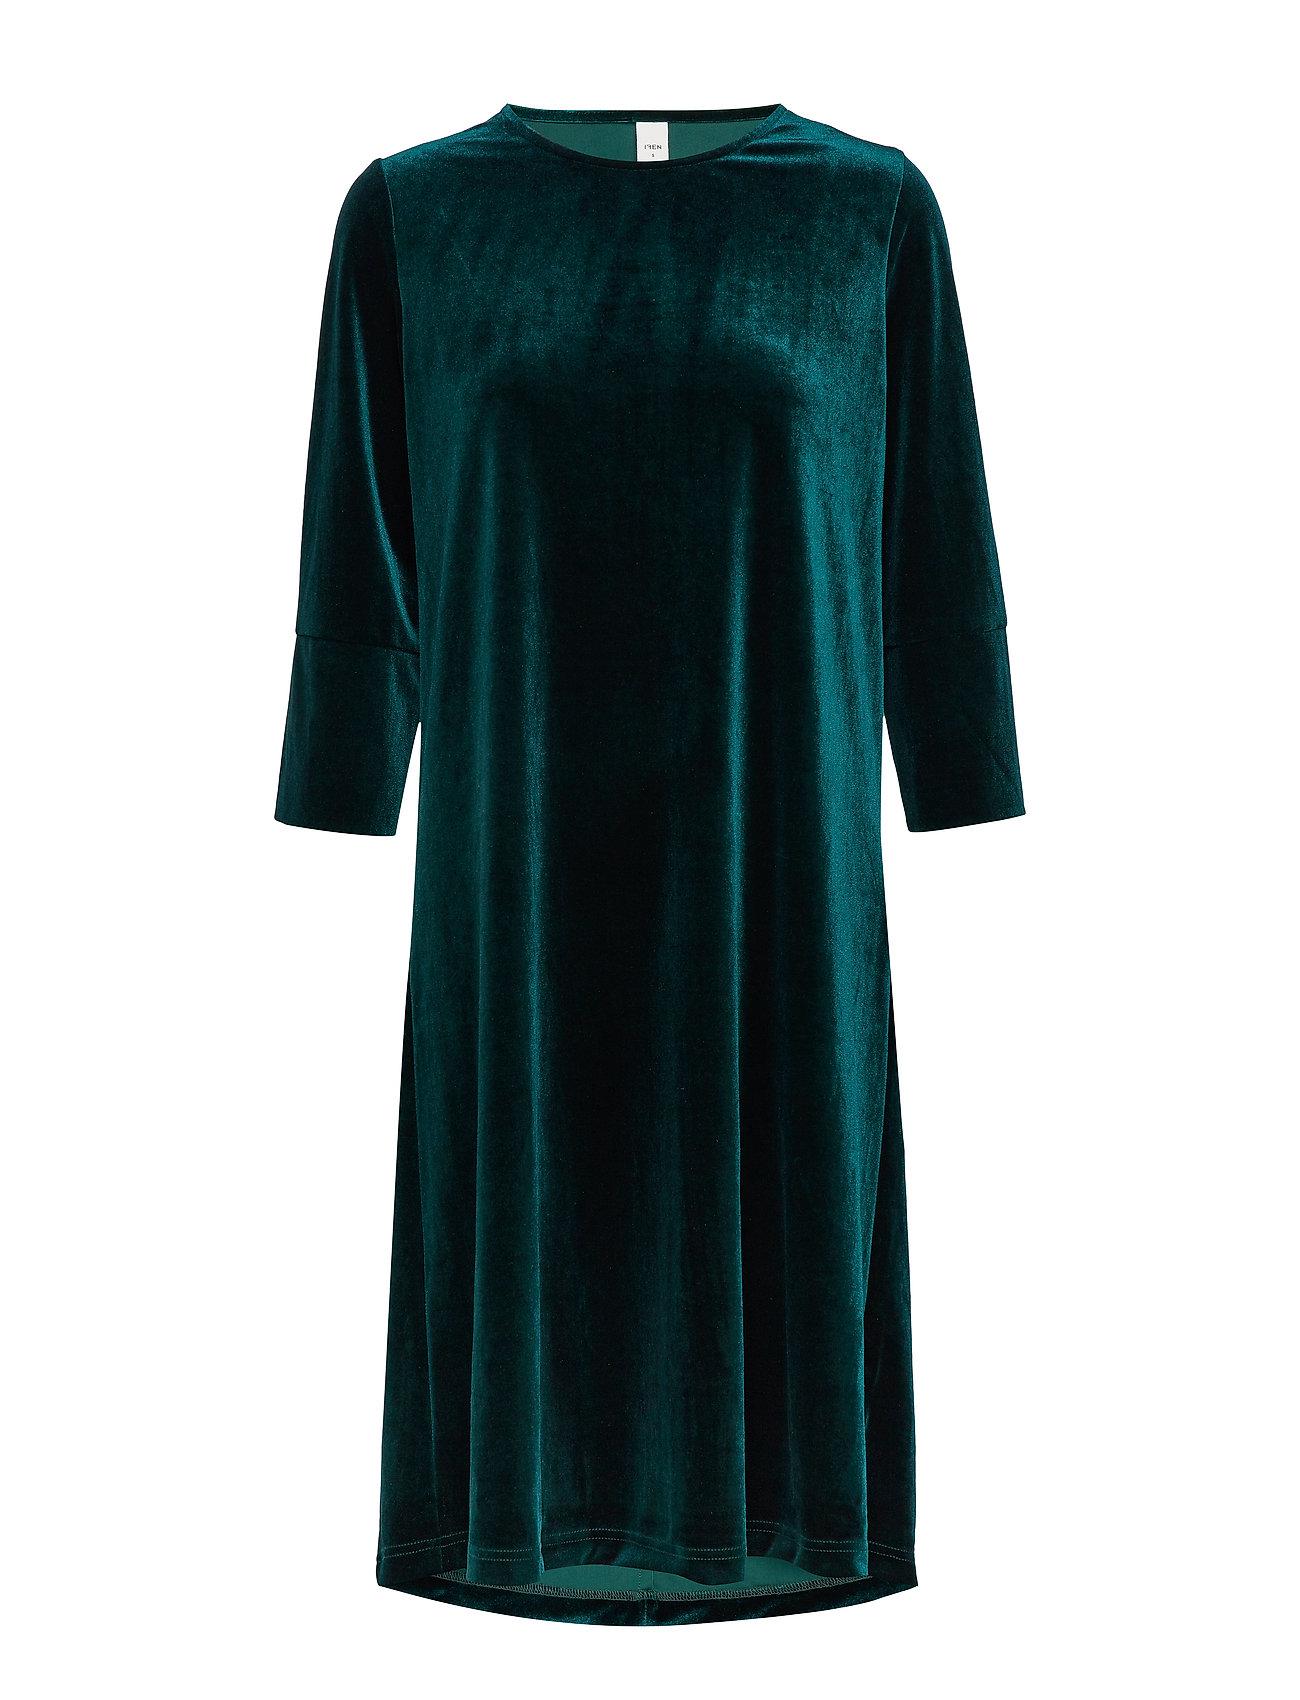 IBEN Kobi Dress ST - PINE GREEN